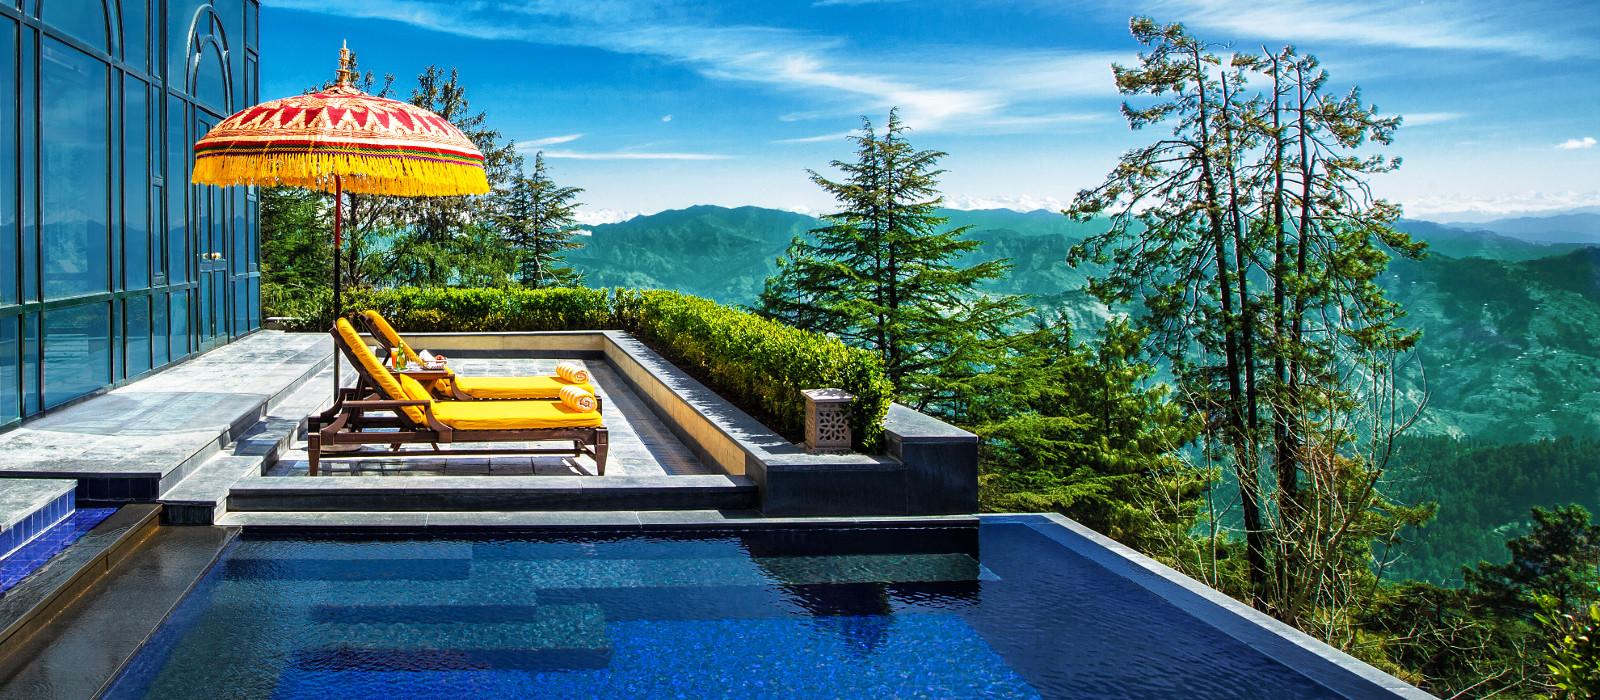 Hotel Wildflower Hall, An Oberoi Resort Himalayas